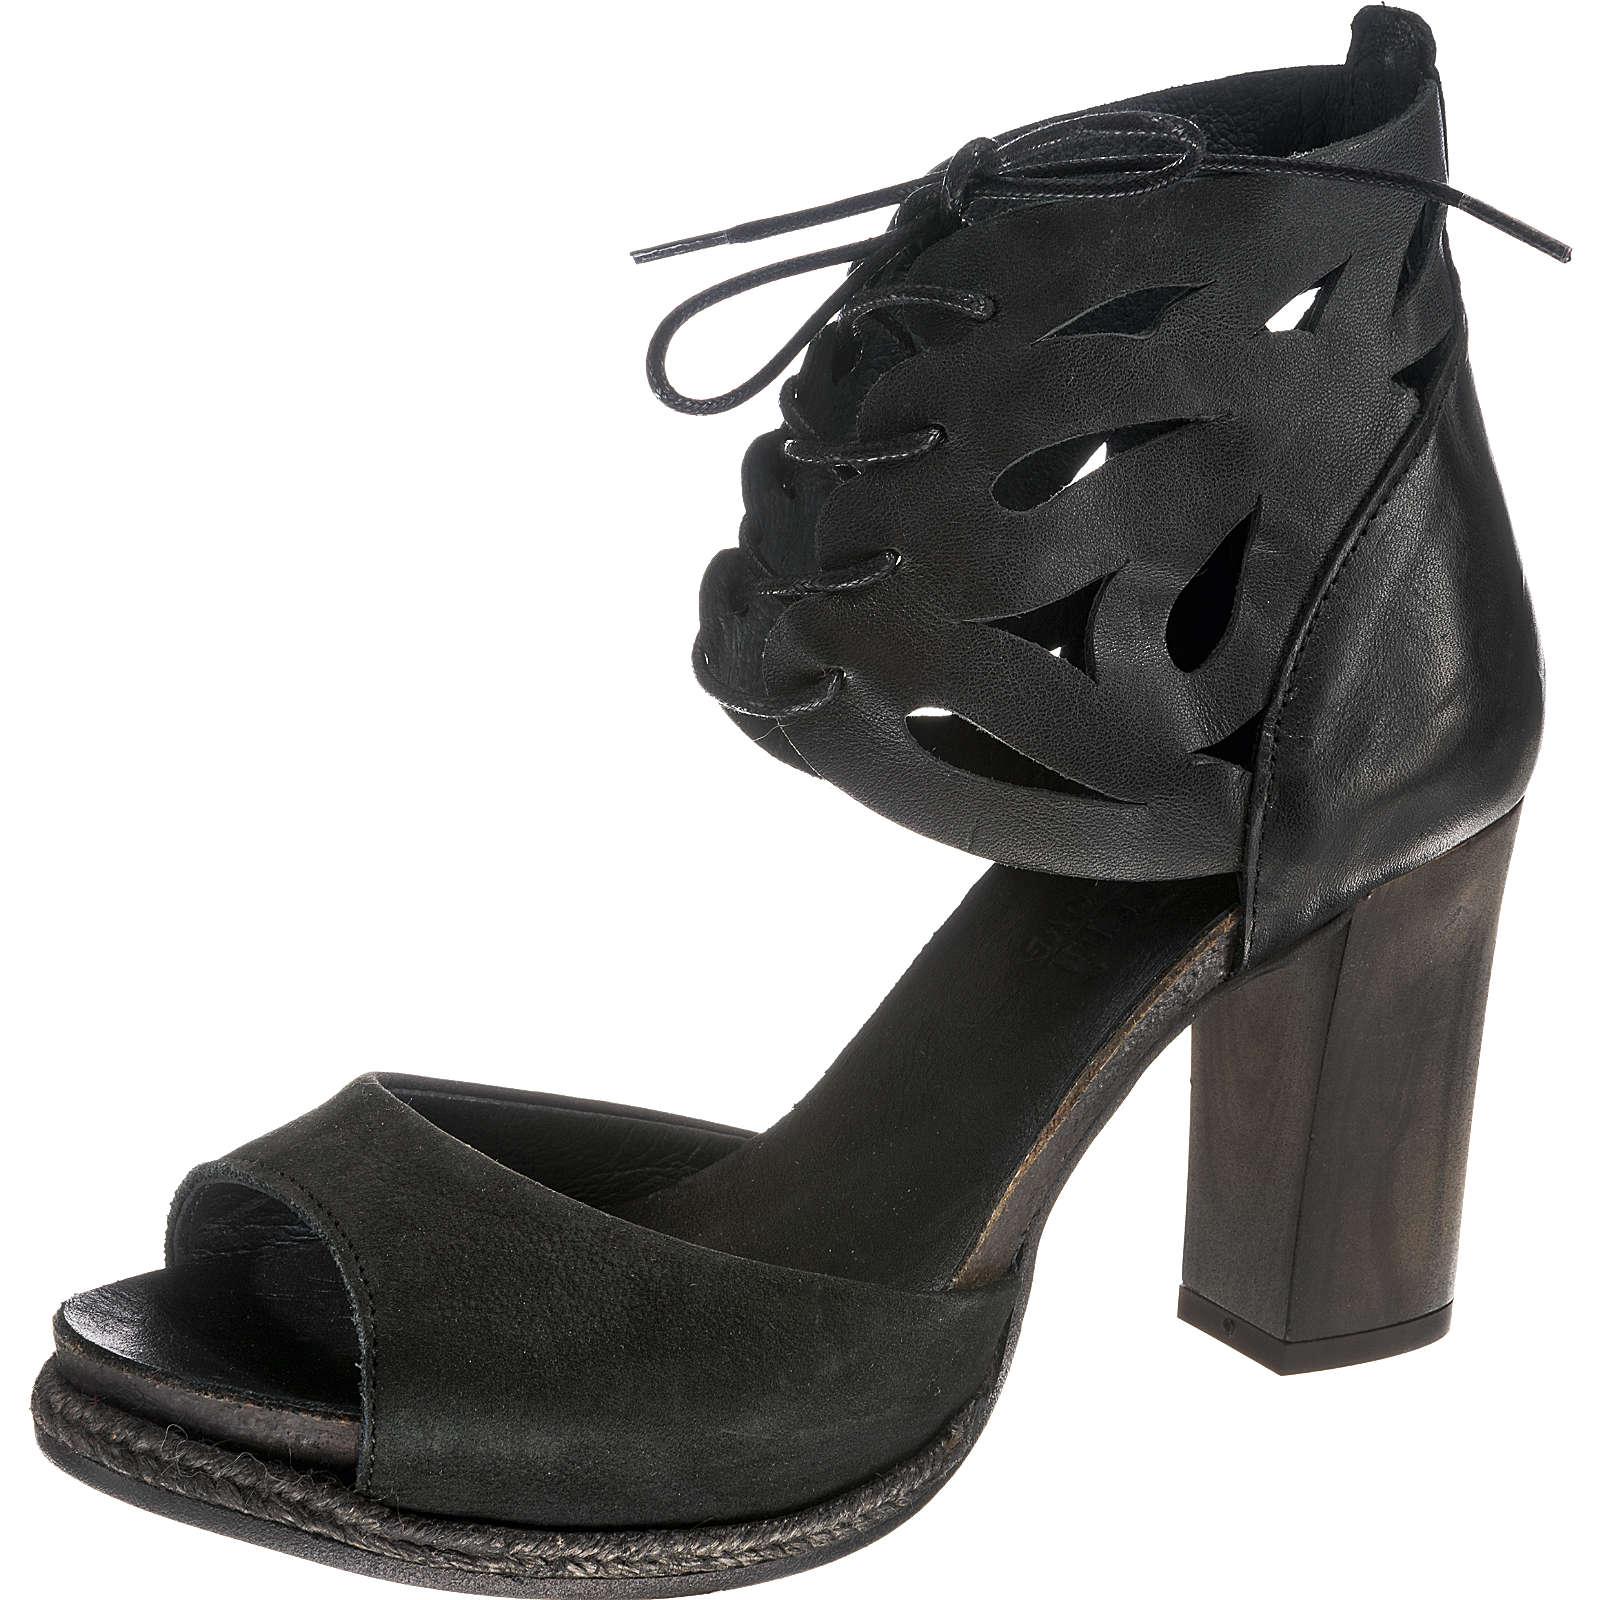 Felmini Klassische Sandaletten schwarz Damen Gr. 40